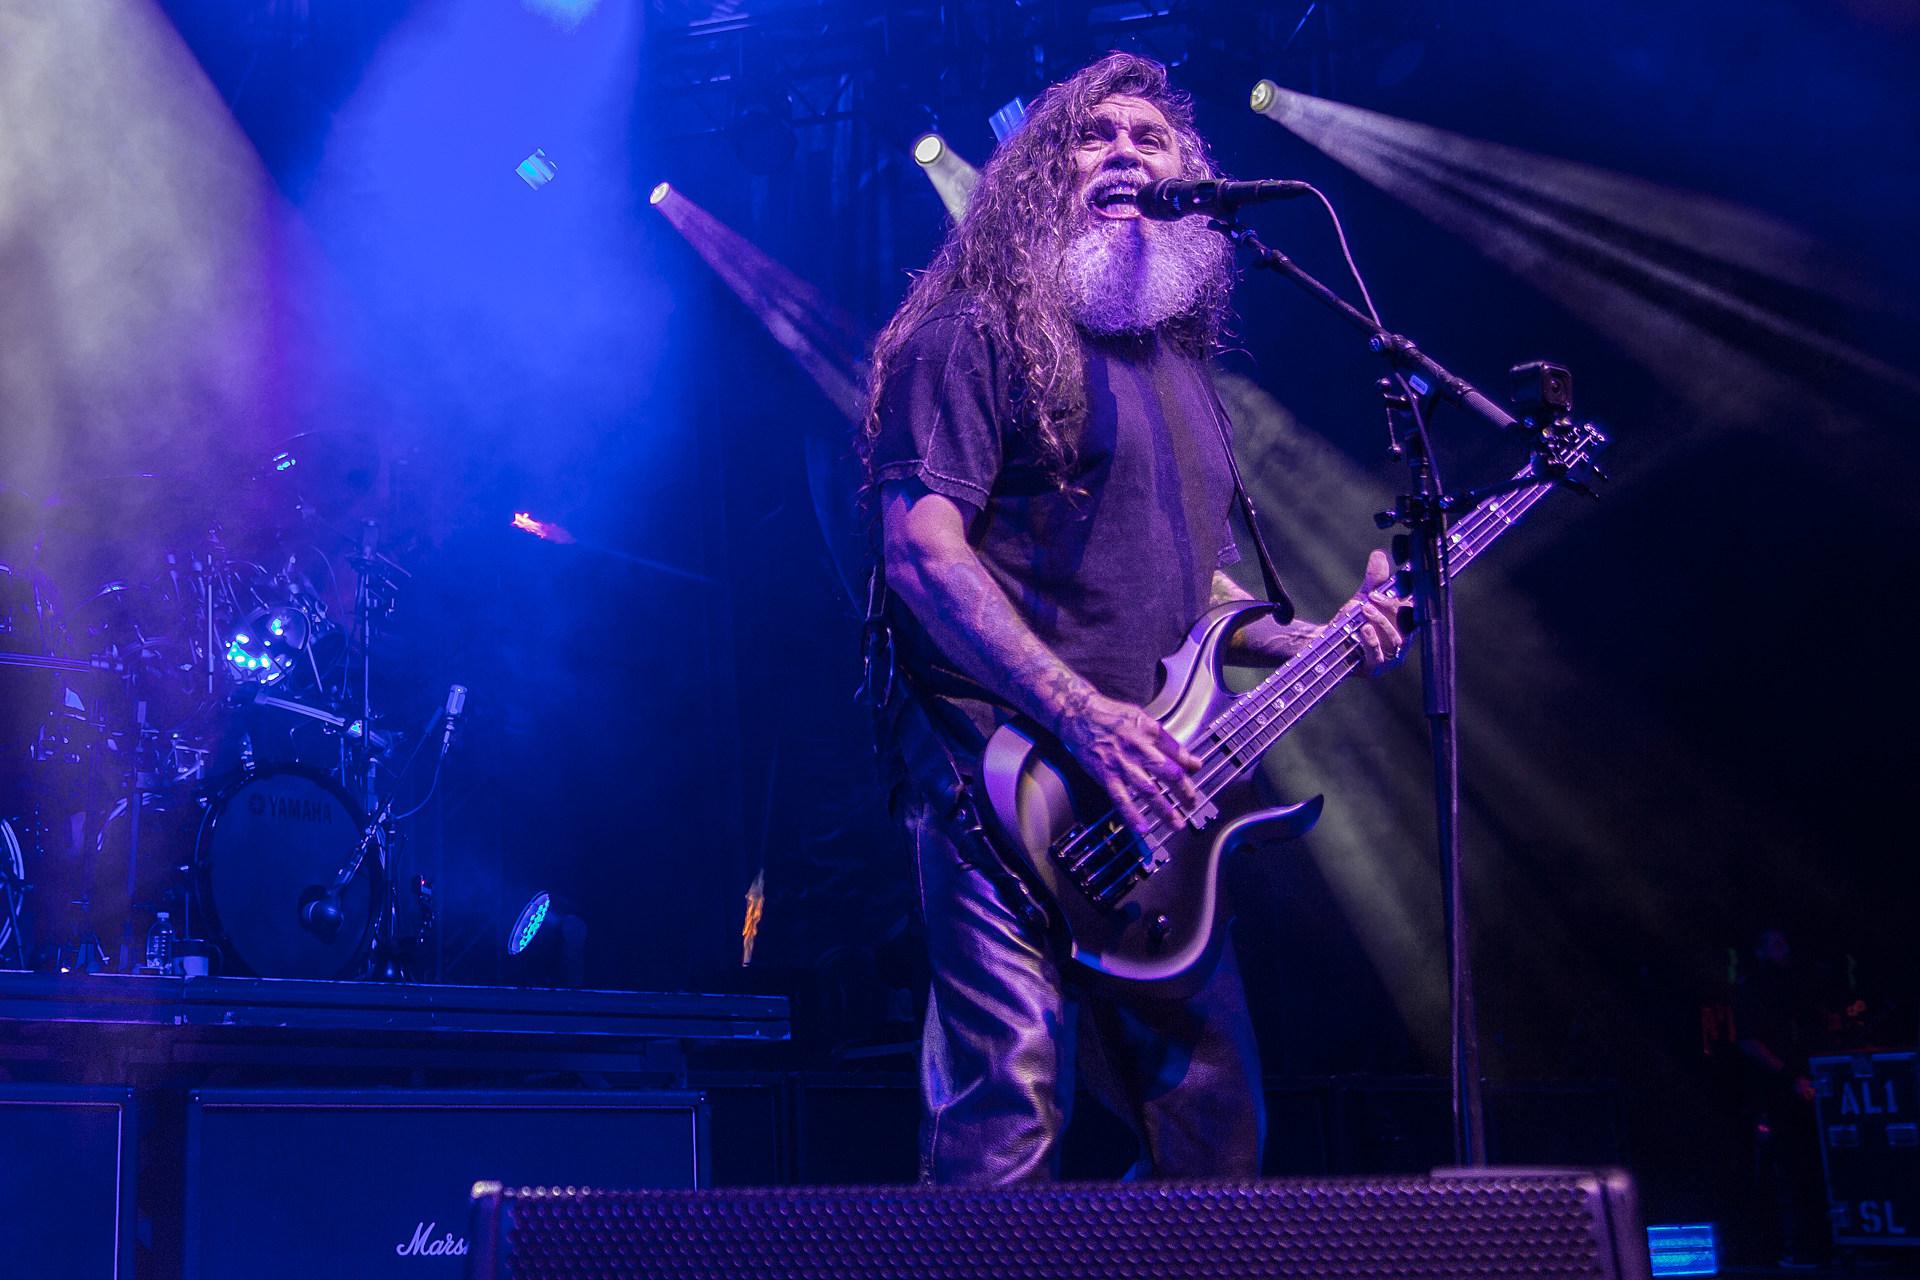 Slayer's Tom Araya Reveals Struggle With Sleep Apnea + Comments on Ukrainian Statue in His Likeness